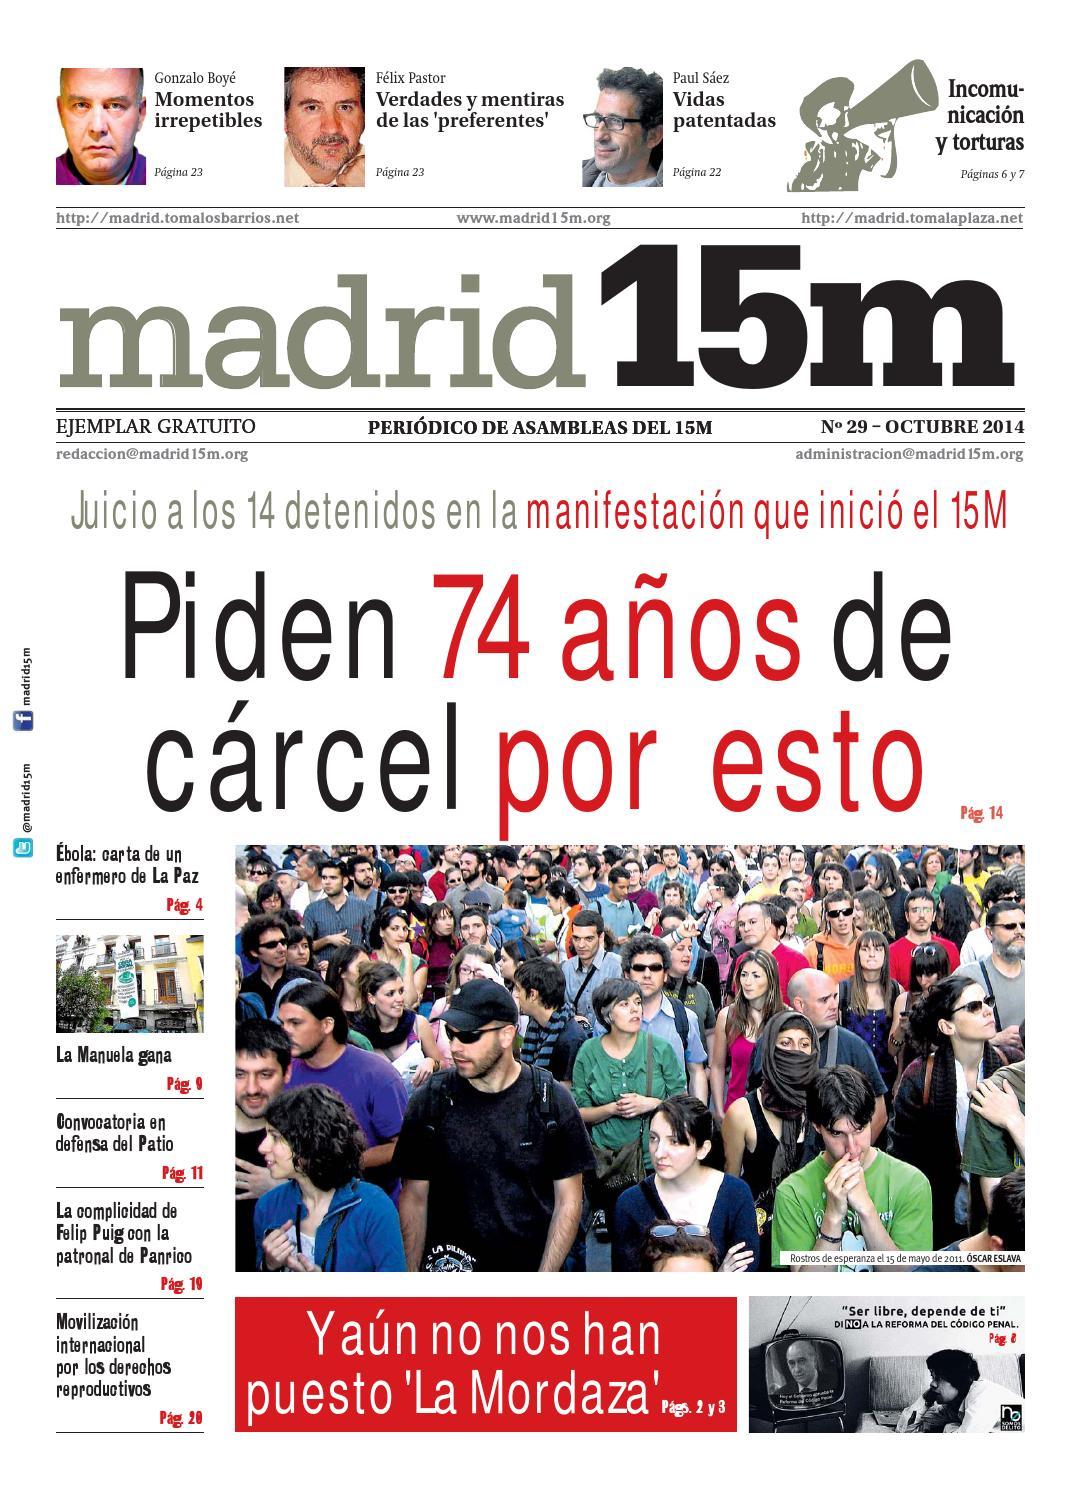 Madrid15m nº 29, octubre 2014 by madrid15m periódico - issuu